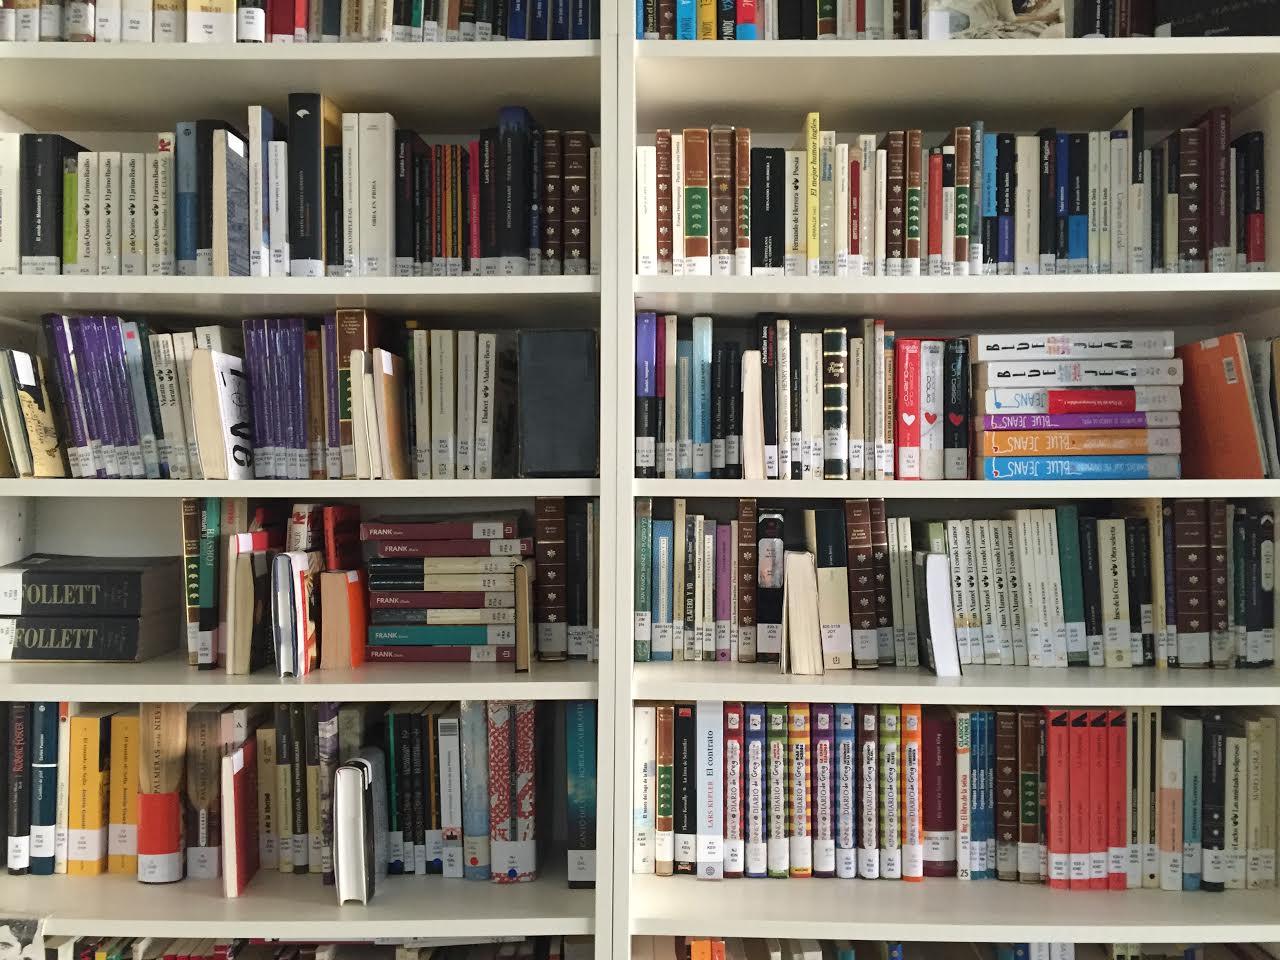 Biblioteca ies ciudad jardin for Ies ciudad jardin